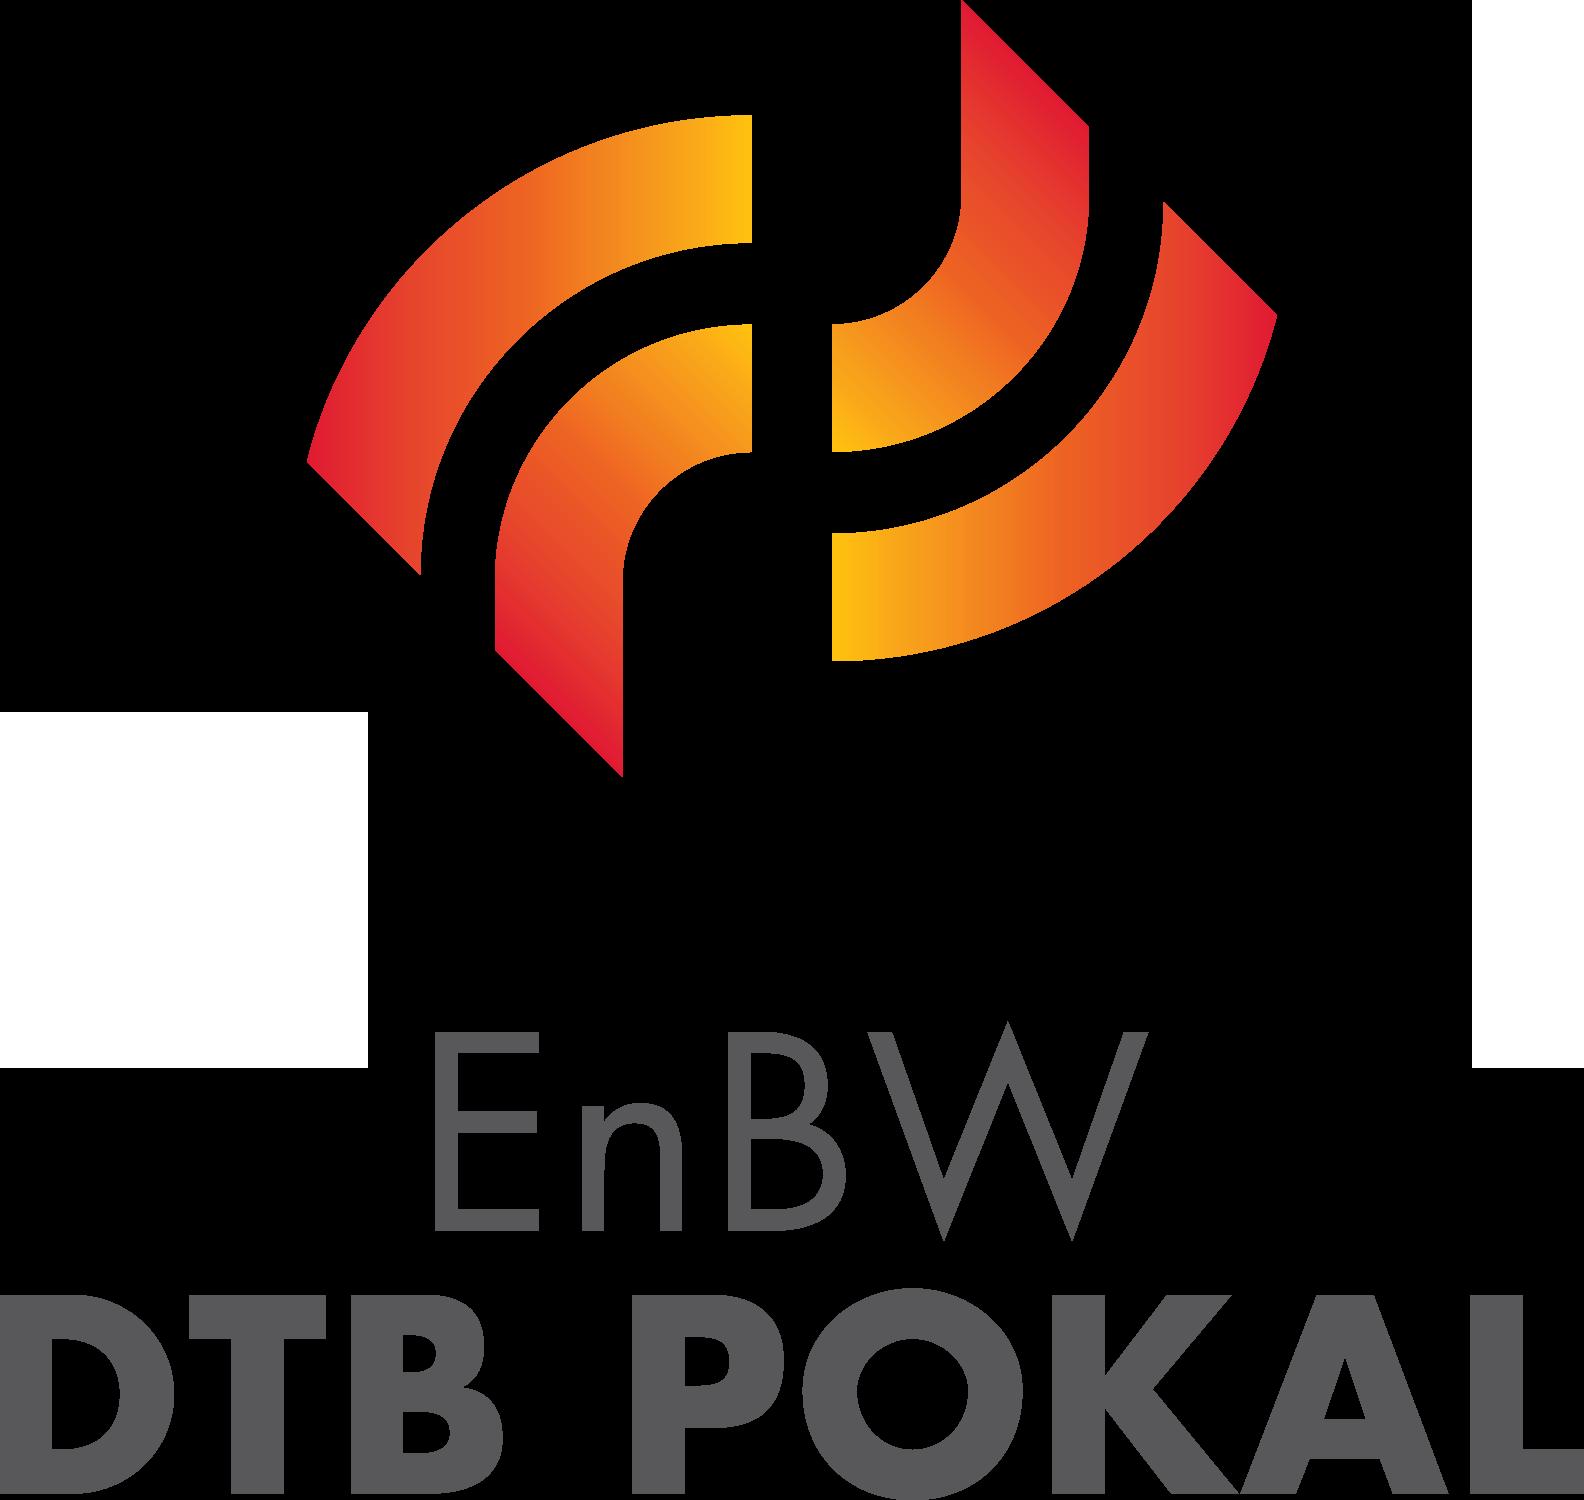 Dtb pokal 2019